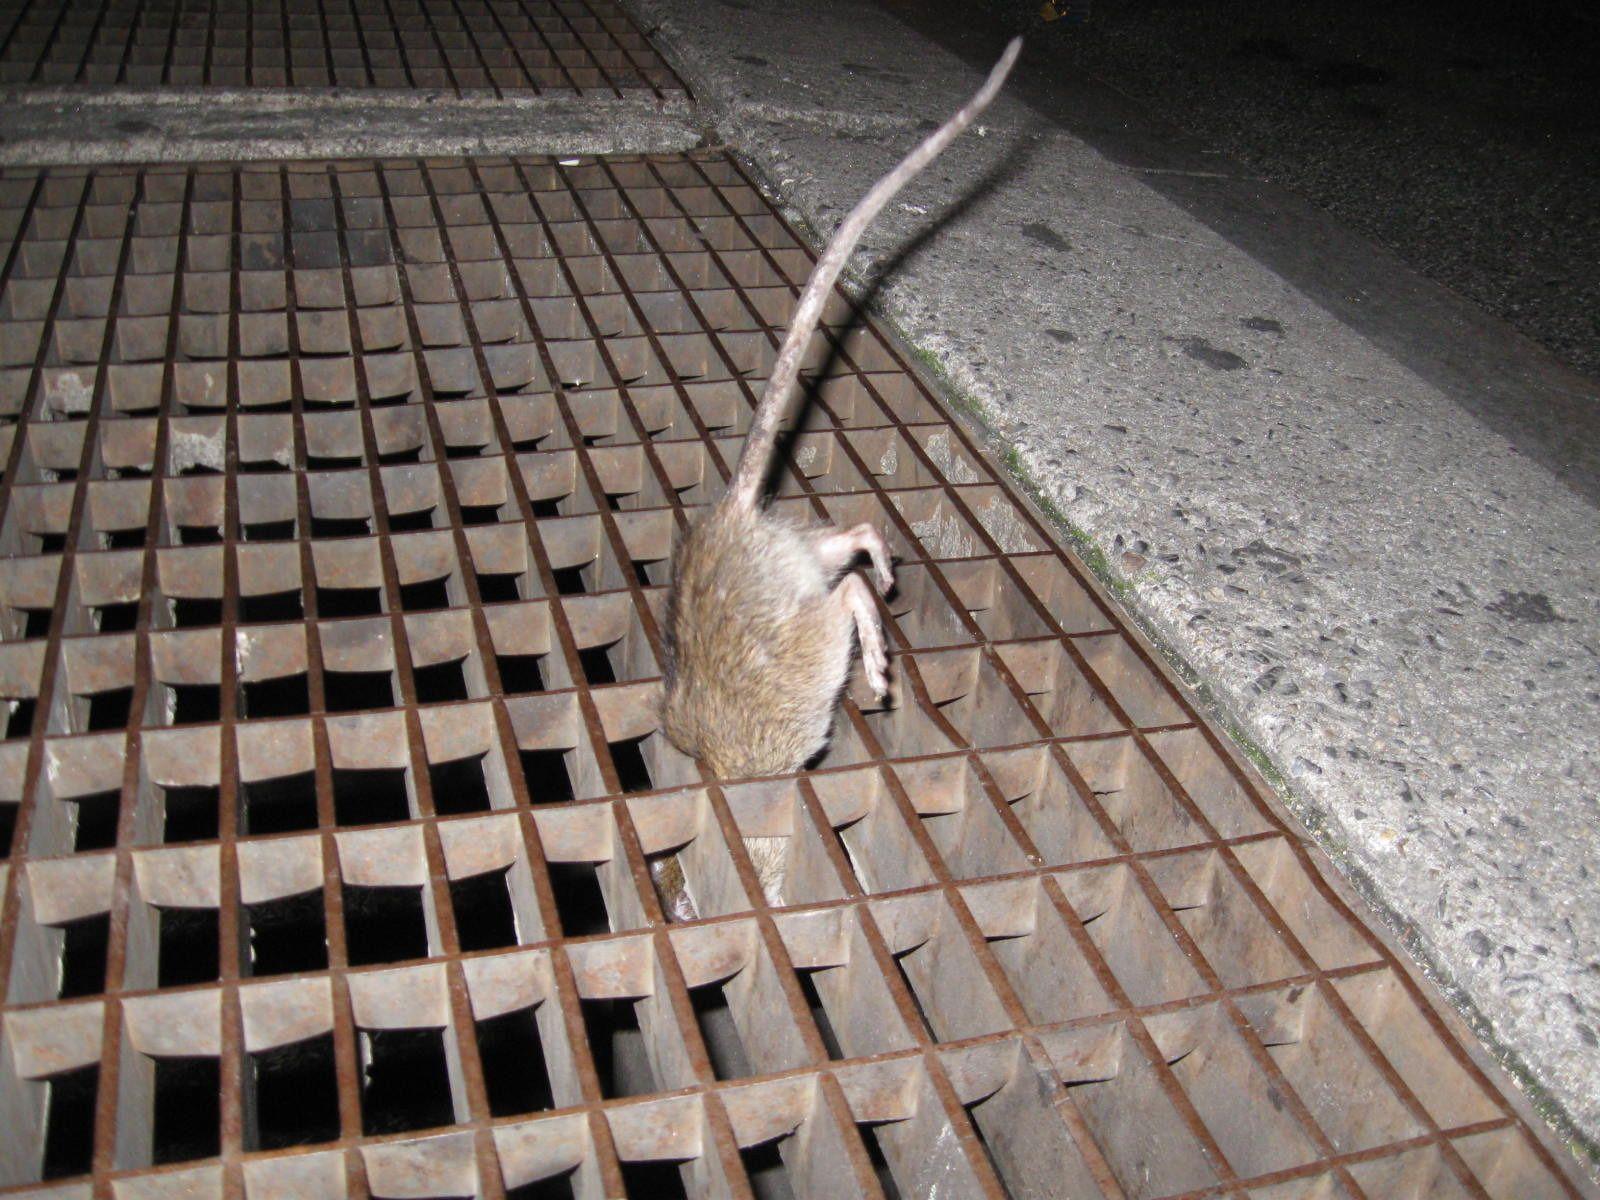 nyc-rat-grate